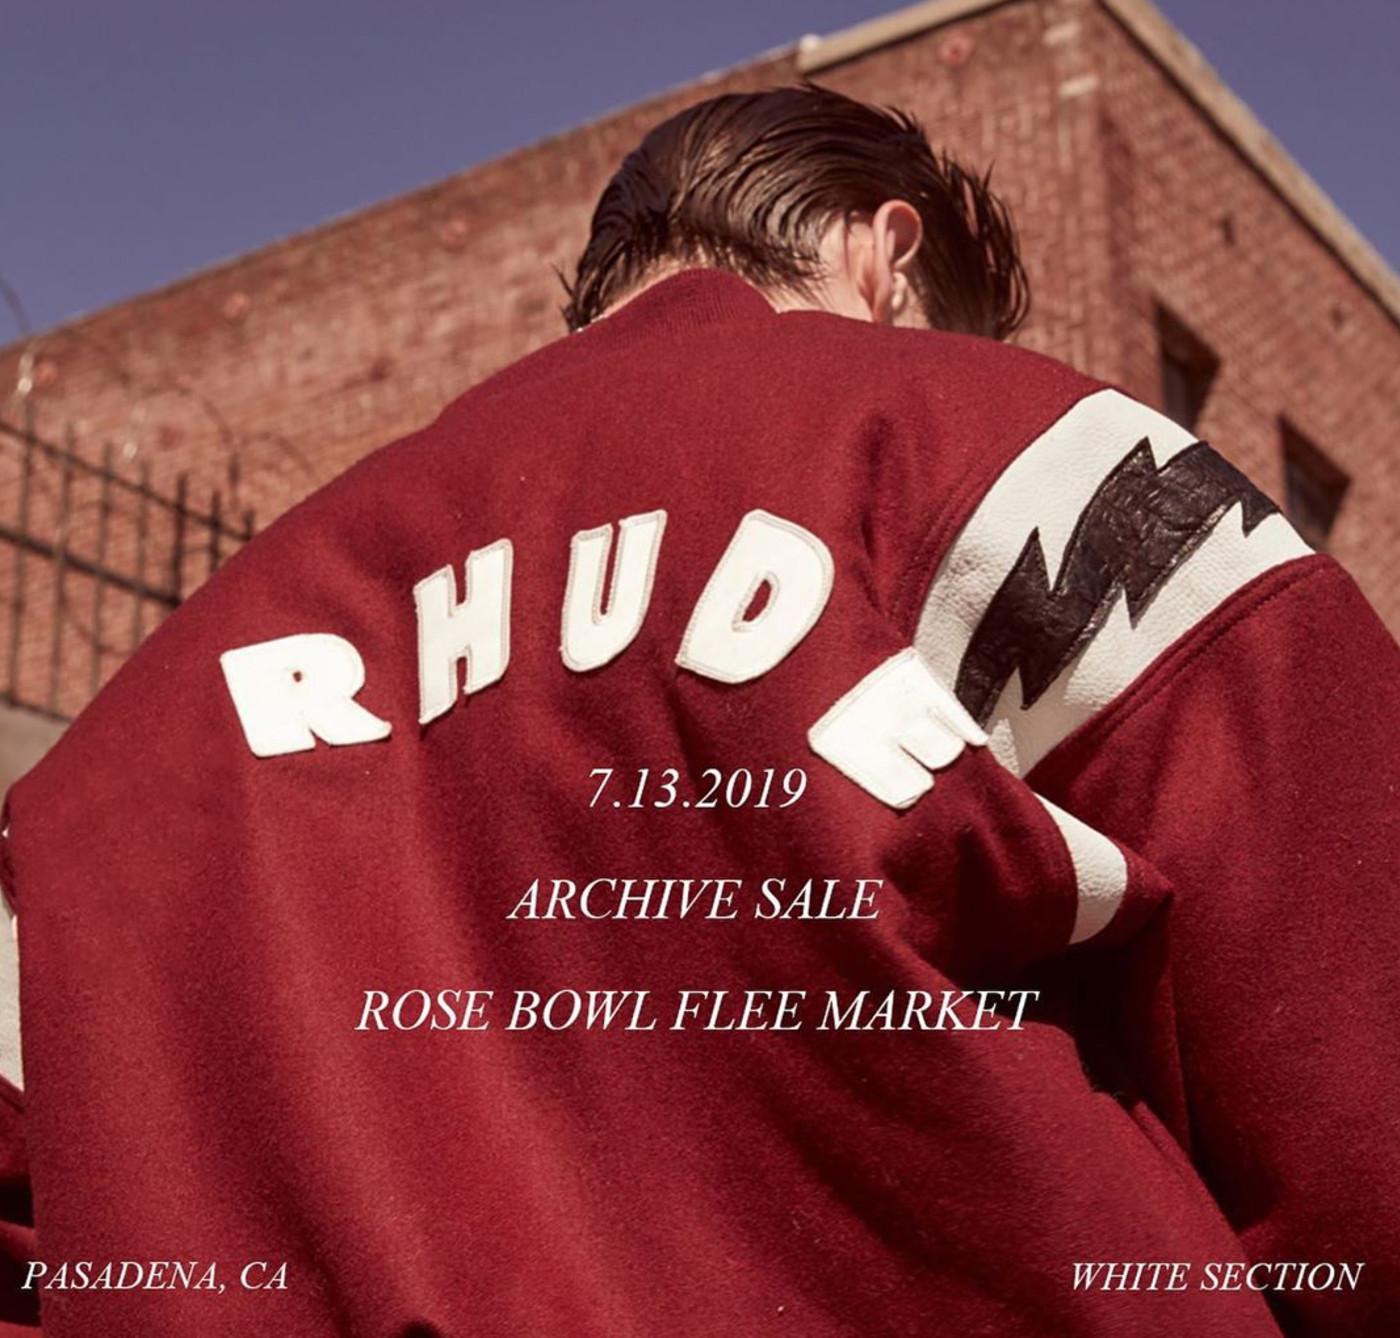 Rhude Archive Sale